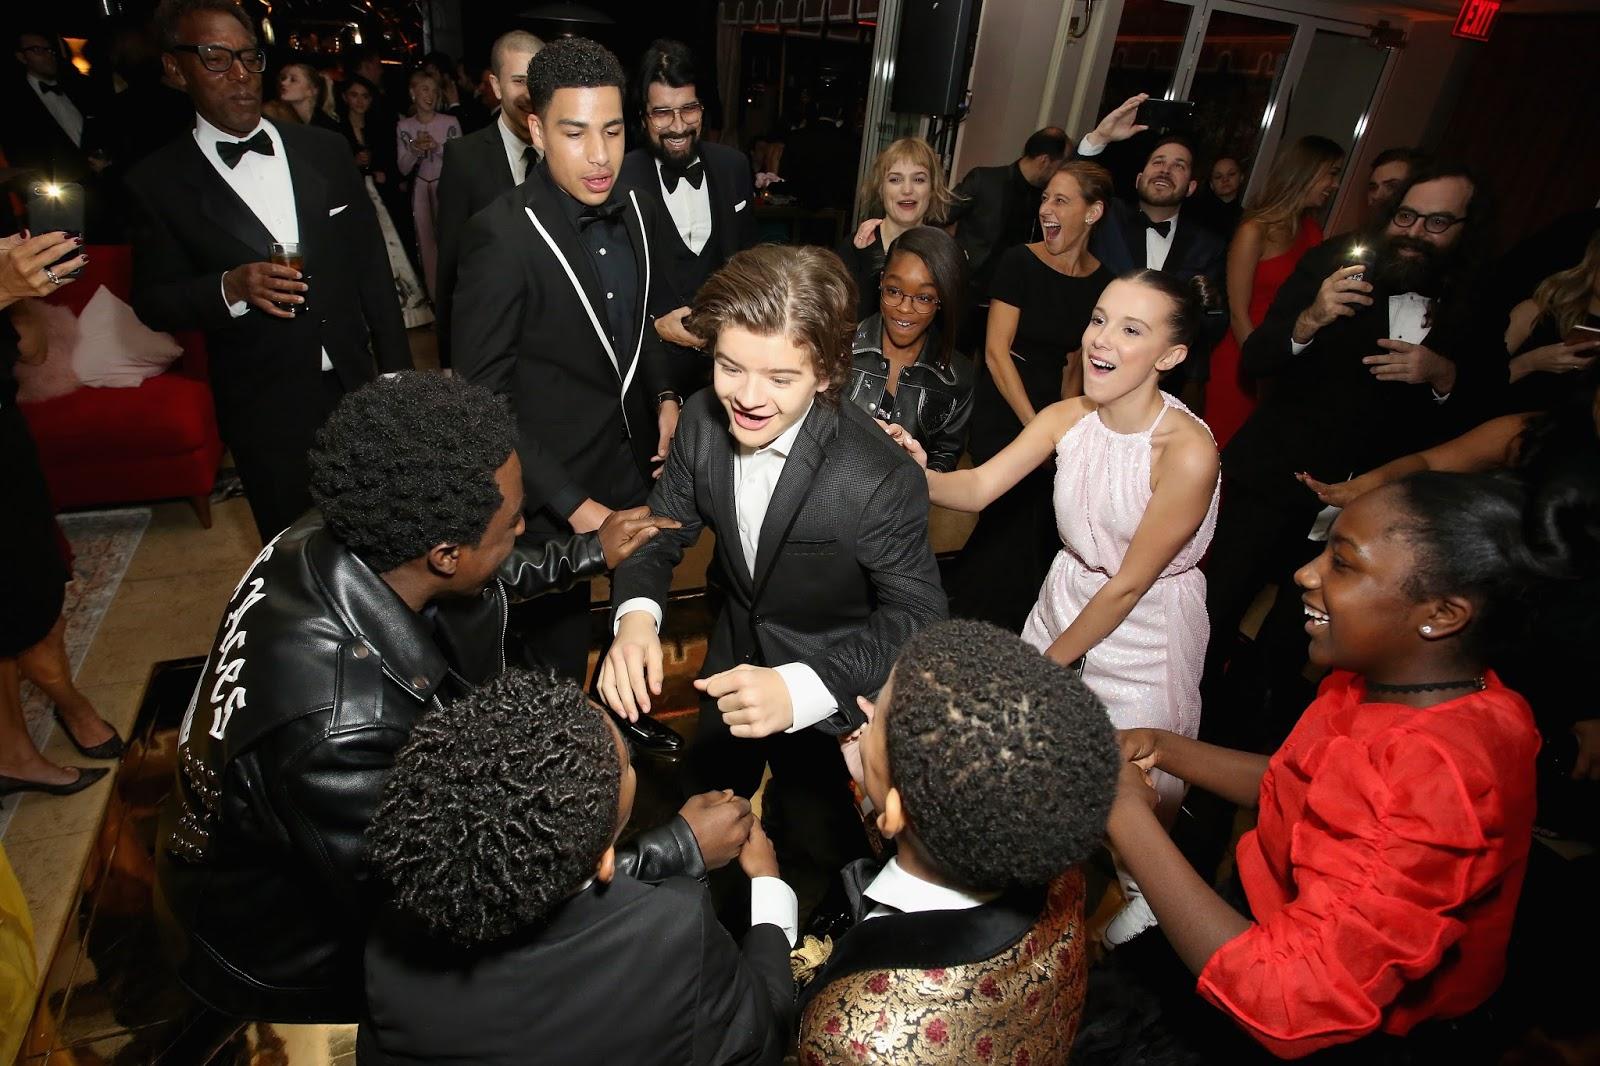 c3a1e386b7c0f Netflix SAG Awards After Party Images - sandwichjohnfilms